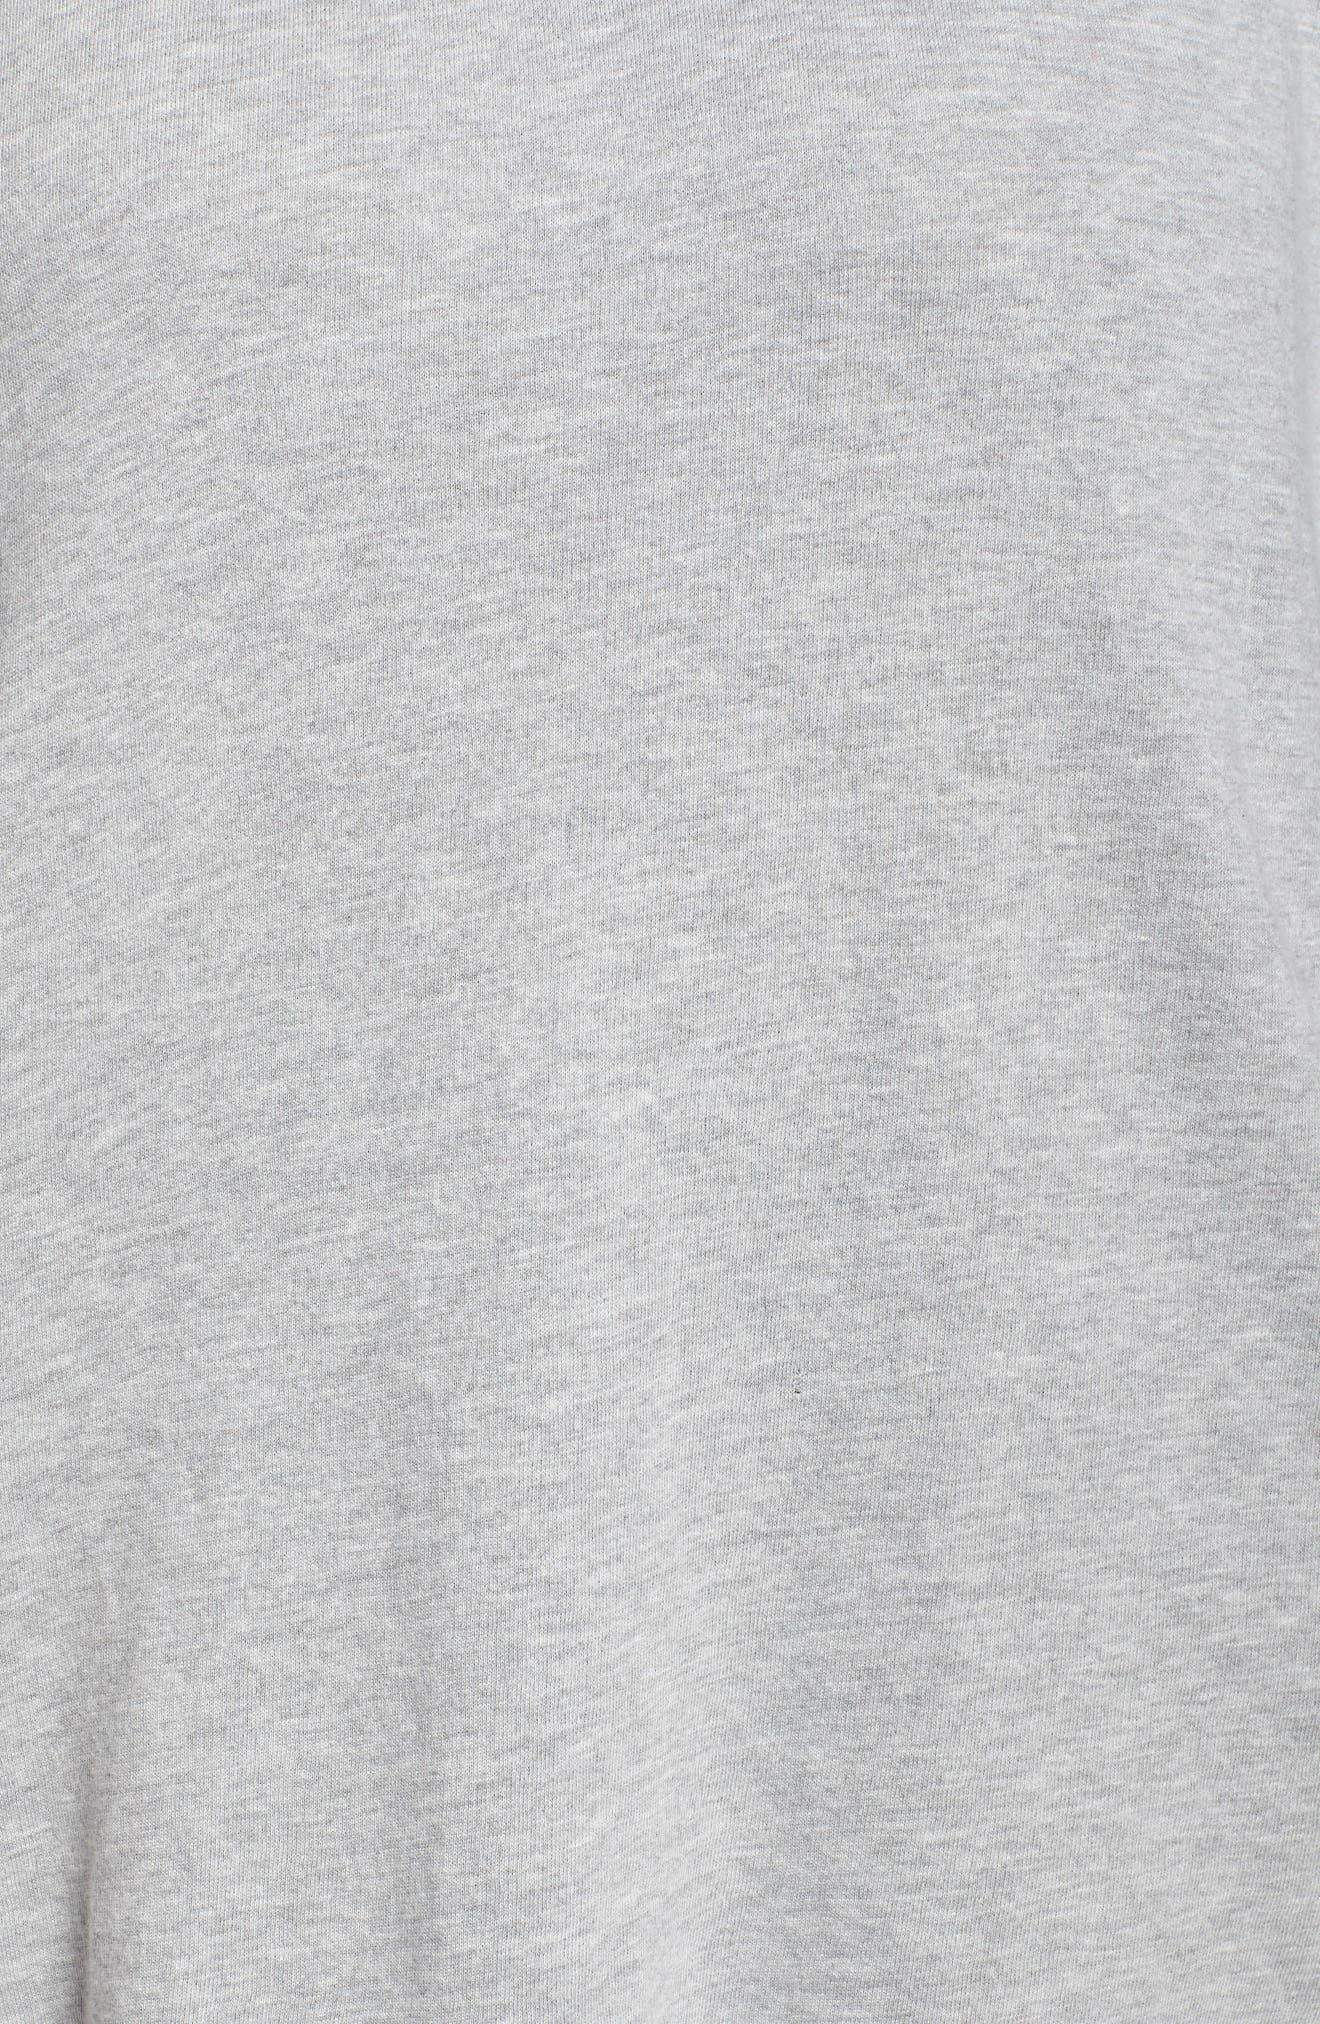 Lace-Up Side Sweatshirt,                             Alternate thumbnail 4, color,                             Grey Heather